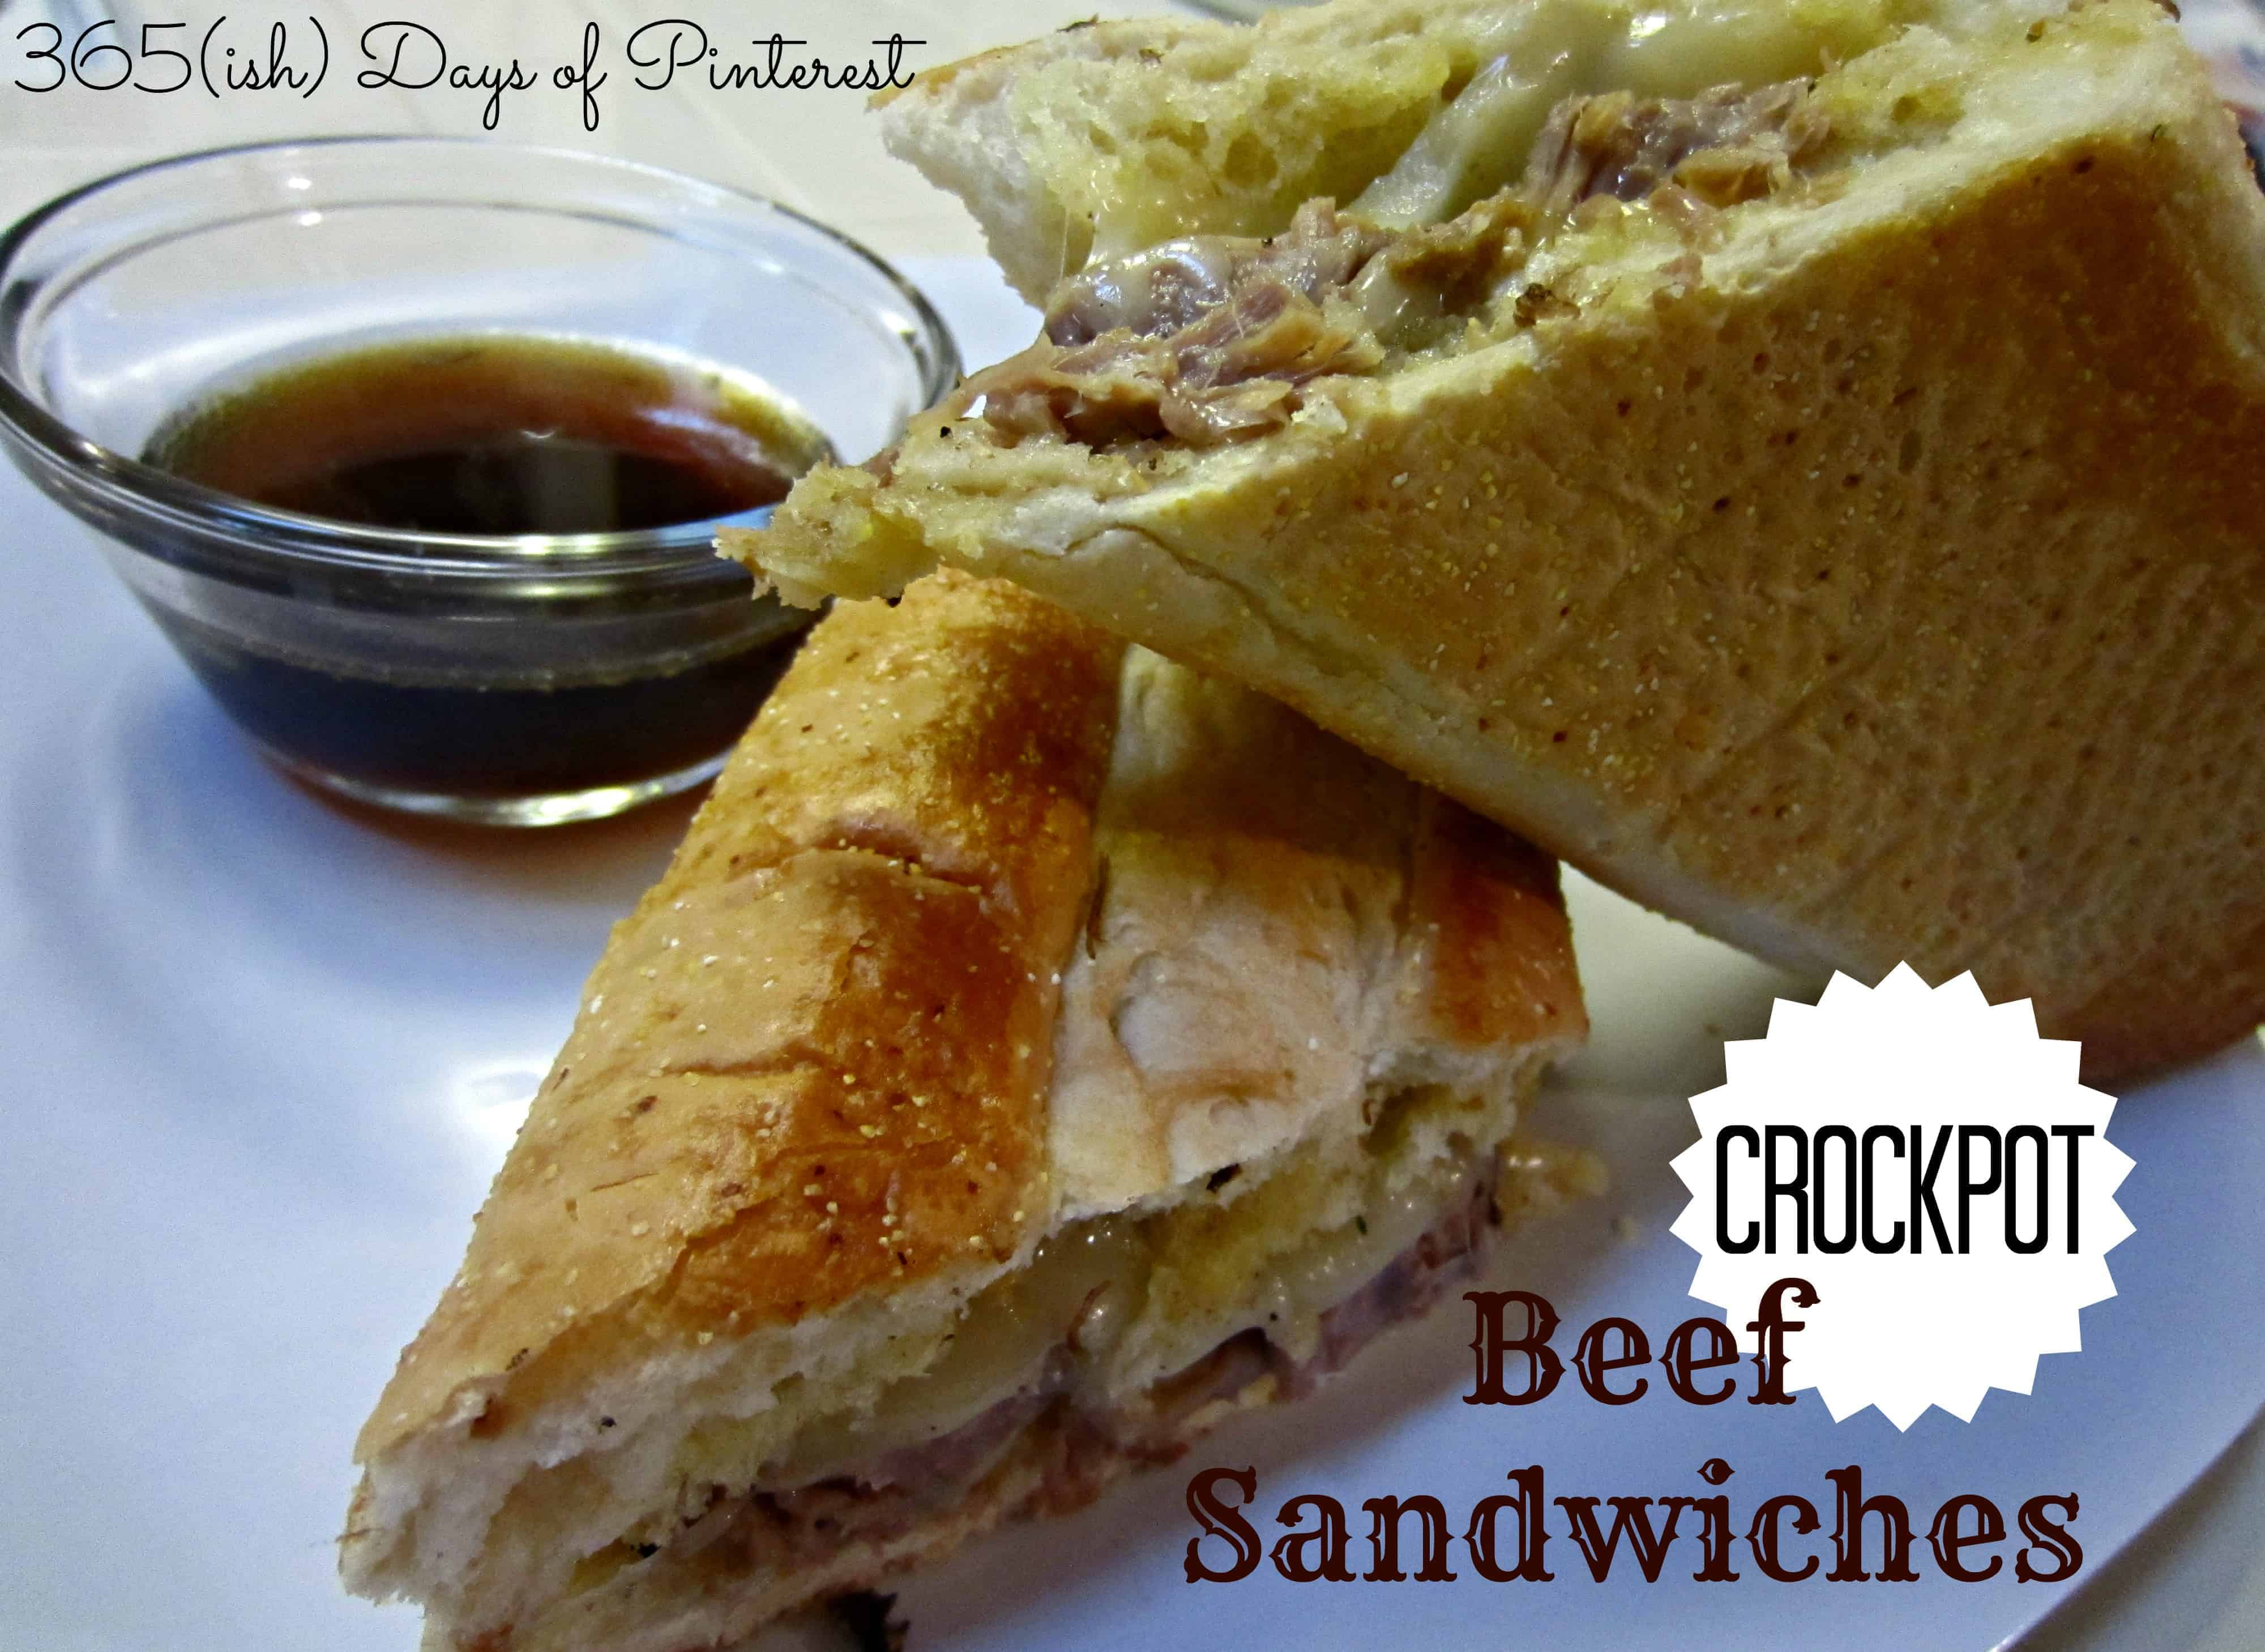 crockpot beef sandwiches